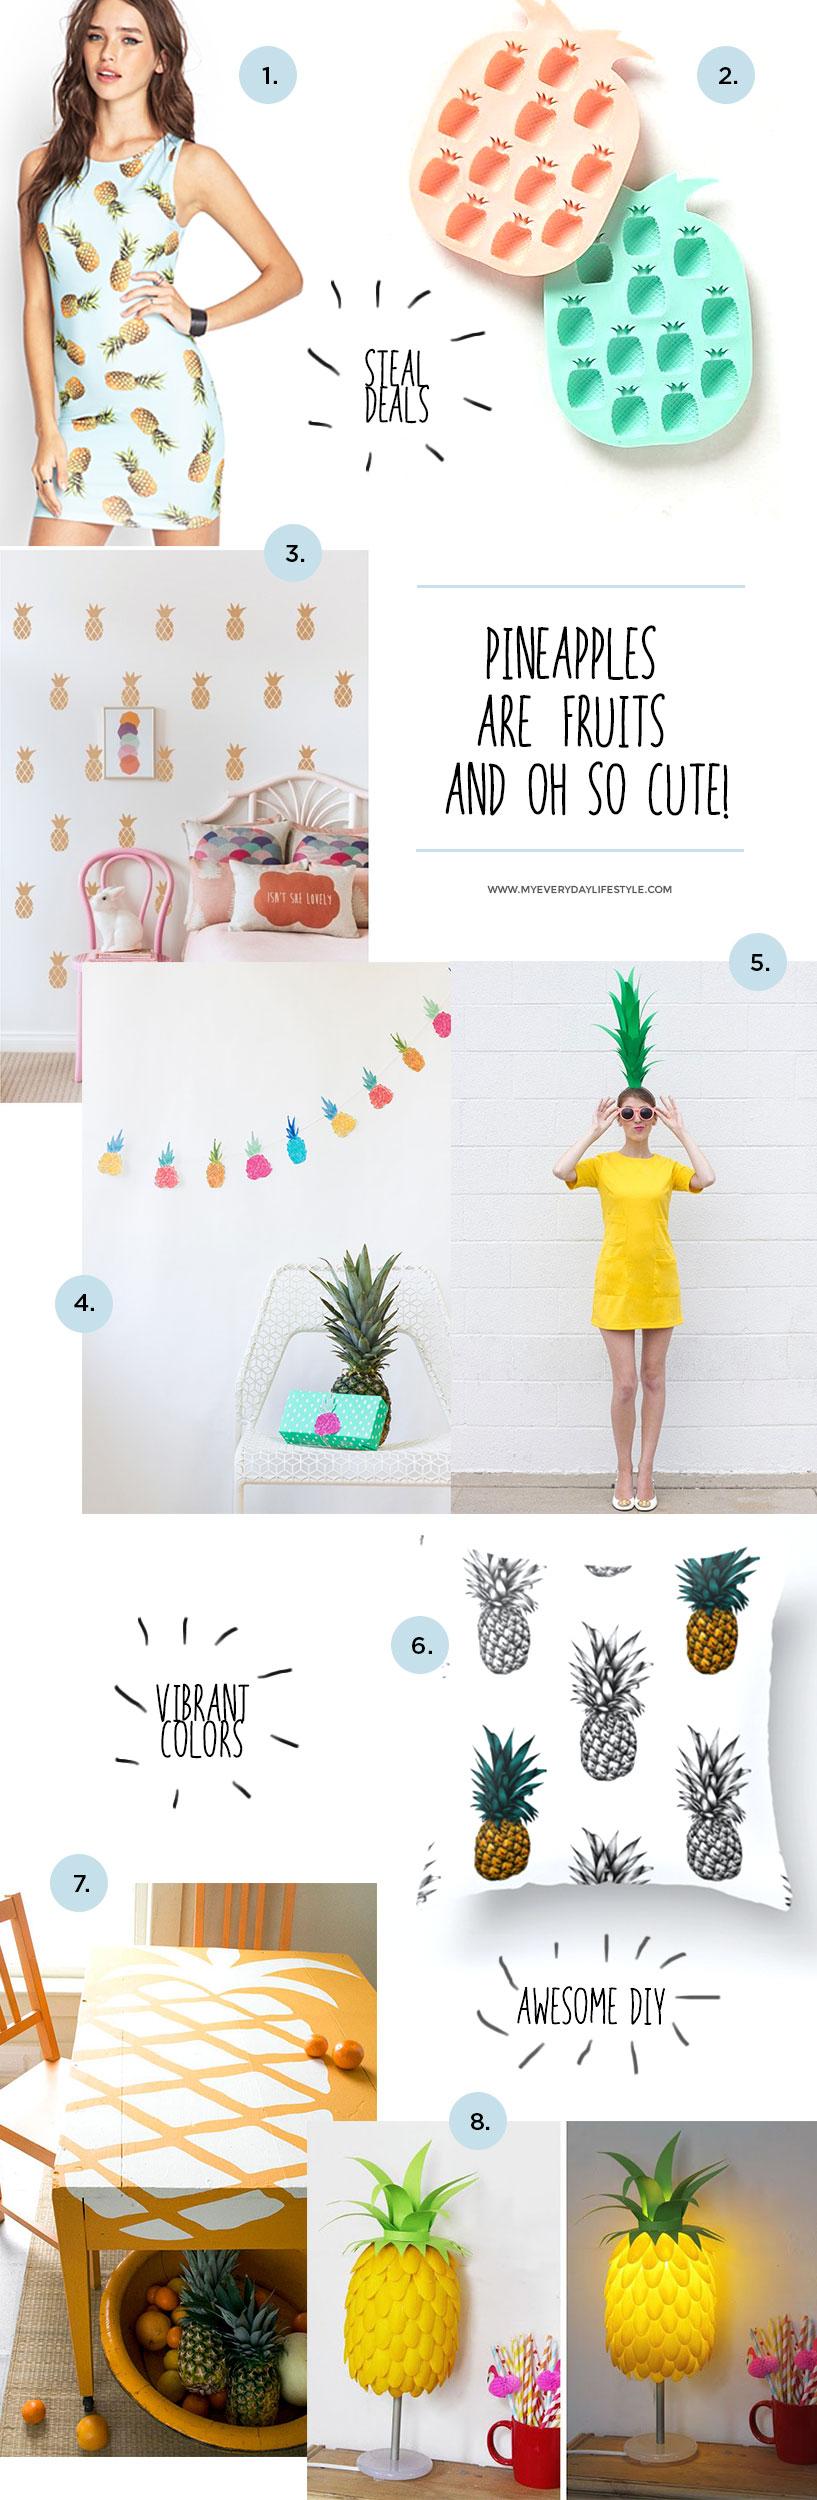 MEL_pineappleroundup.jpg